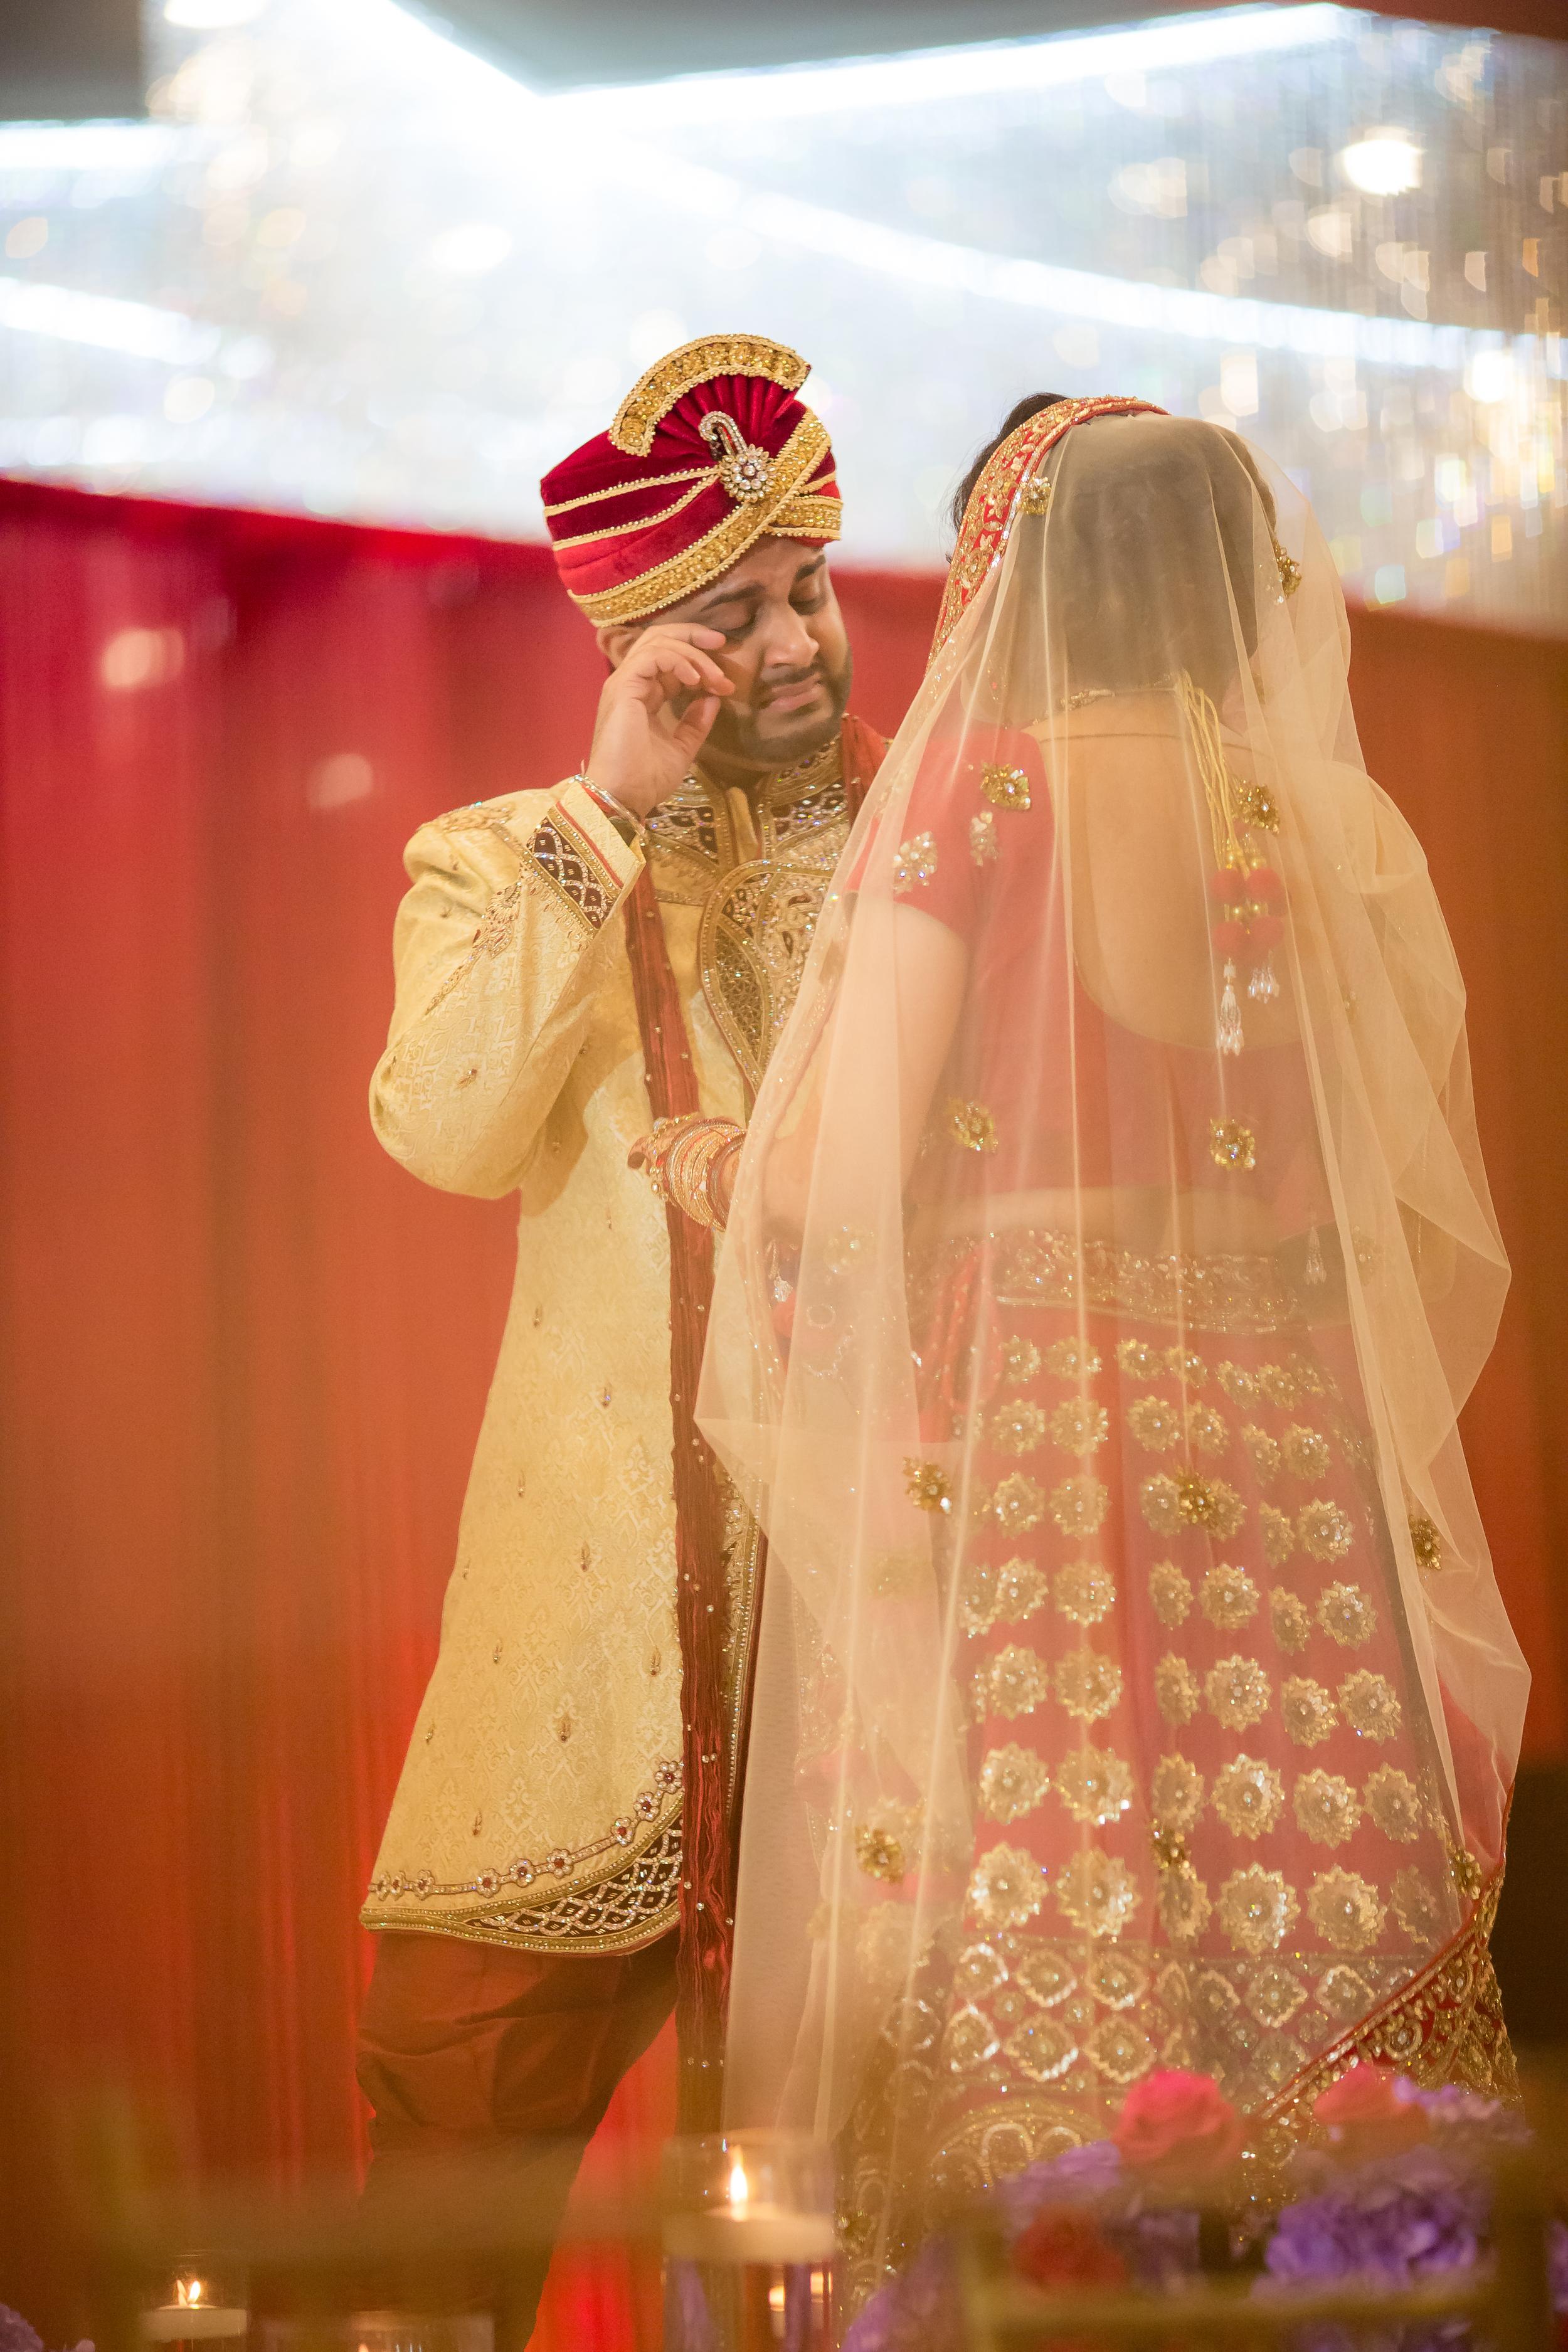 ©MnMfoto-RJ-Wedding-105.jpg